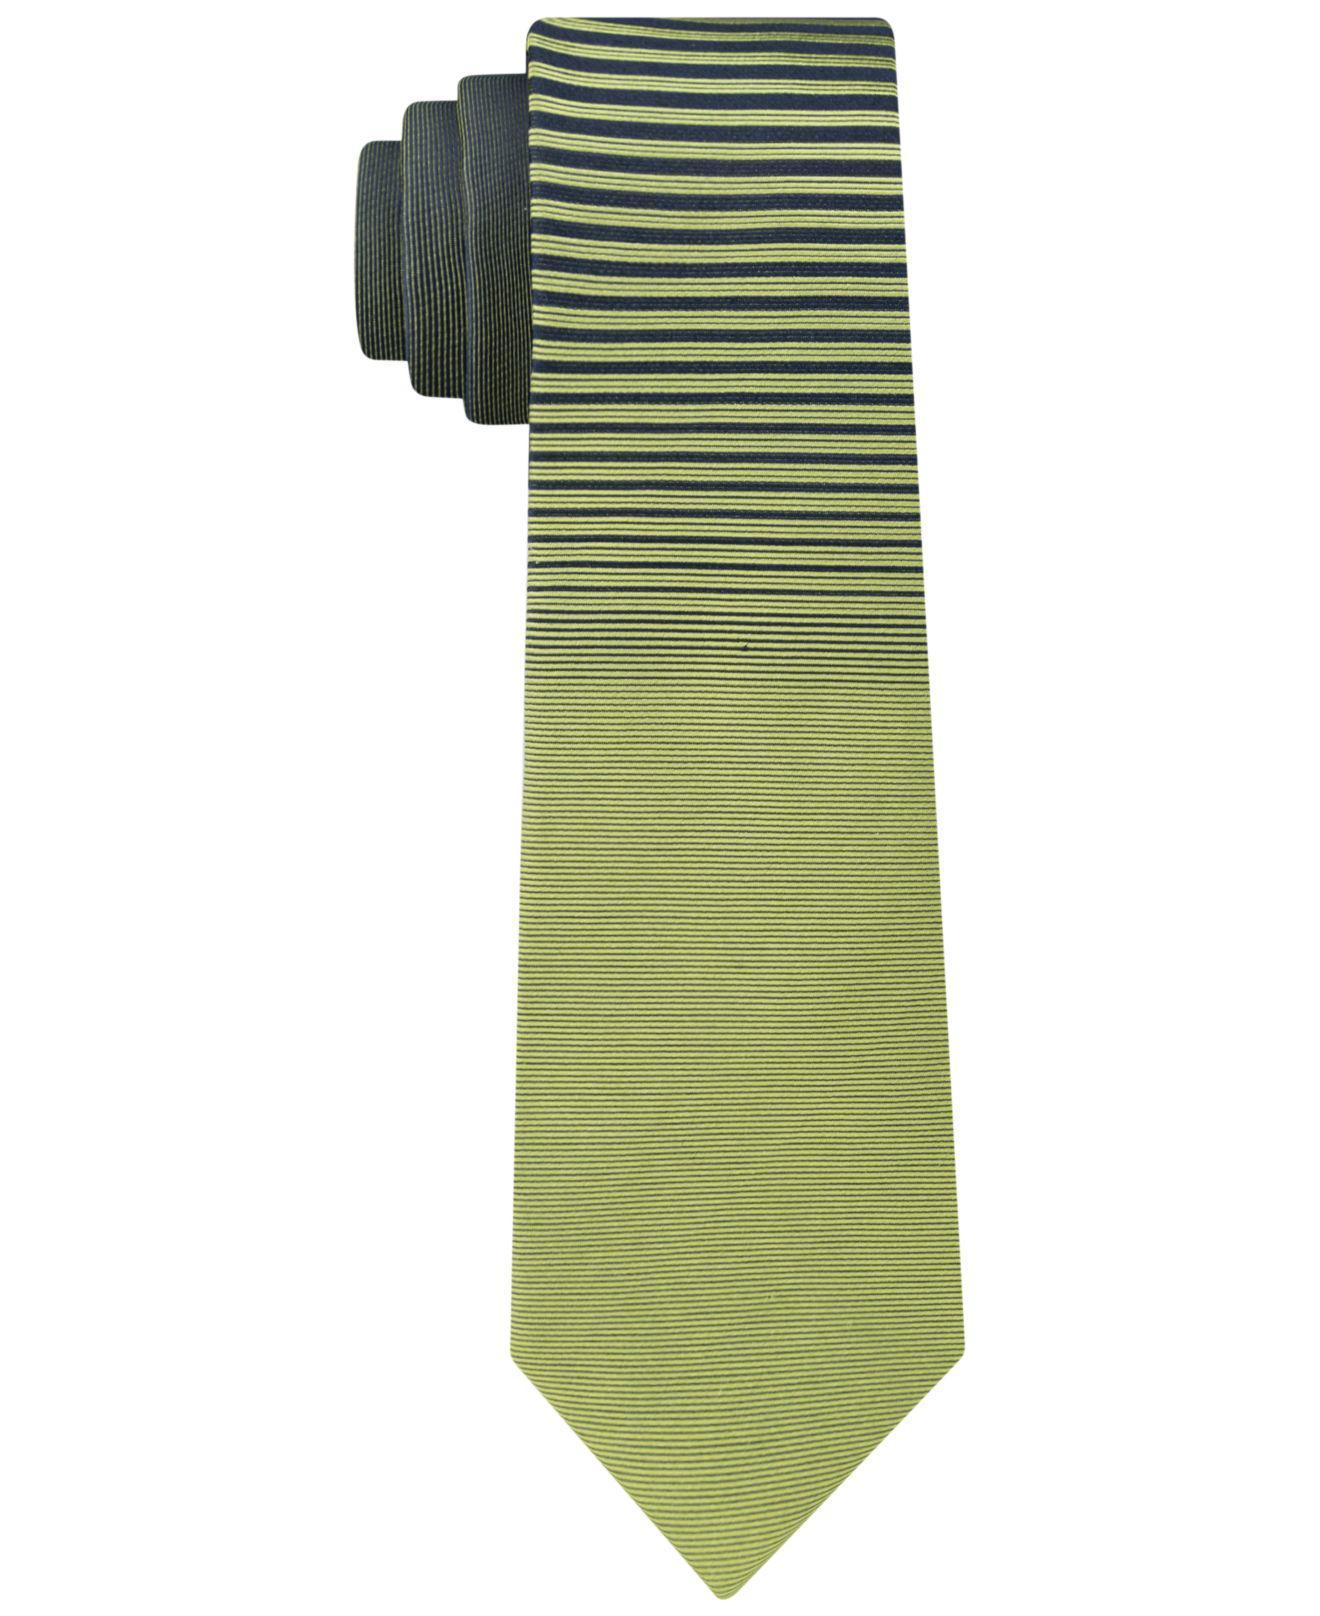 876e8faea0af Lyst - Calvin Klein Panel Skinny Silk Tie in Green for Men